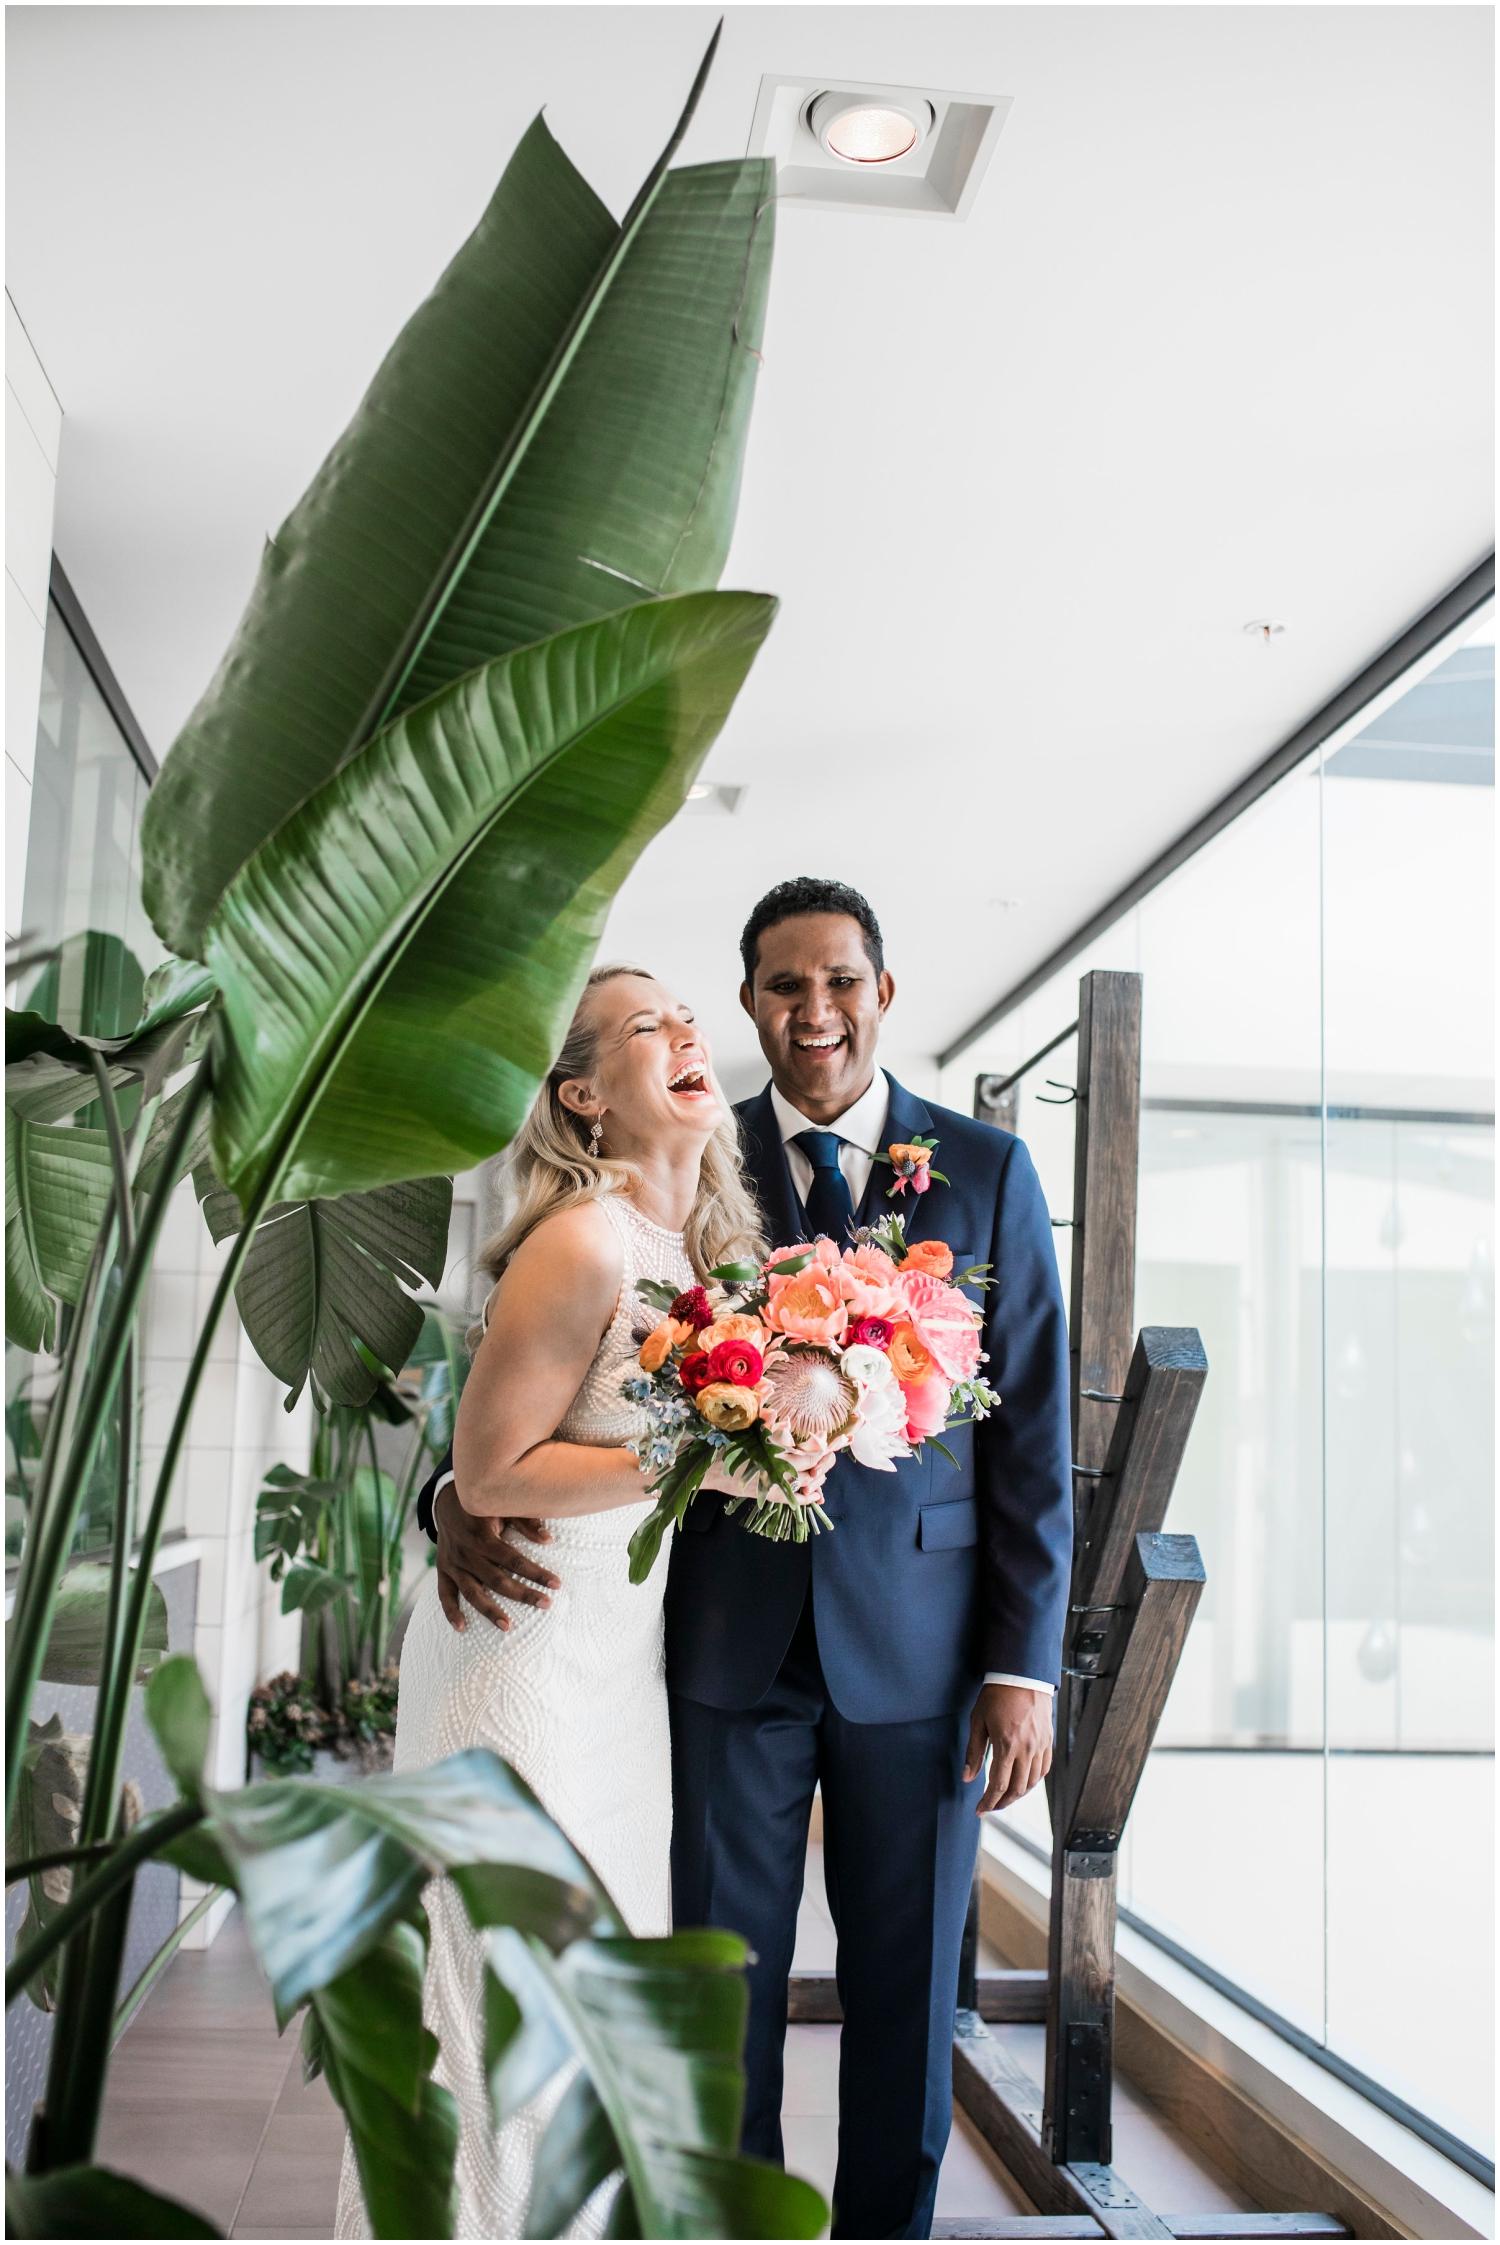 Tropical theme wedding - Paikka- Minnesota Wedding Planner_1480.jpg